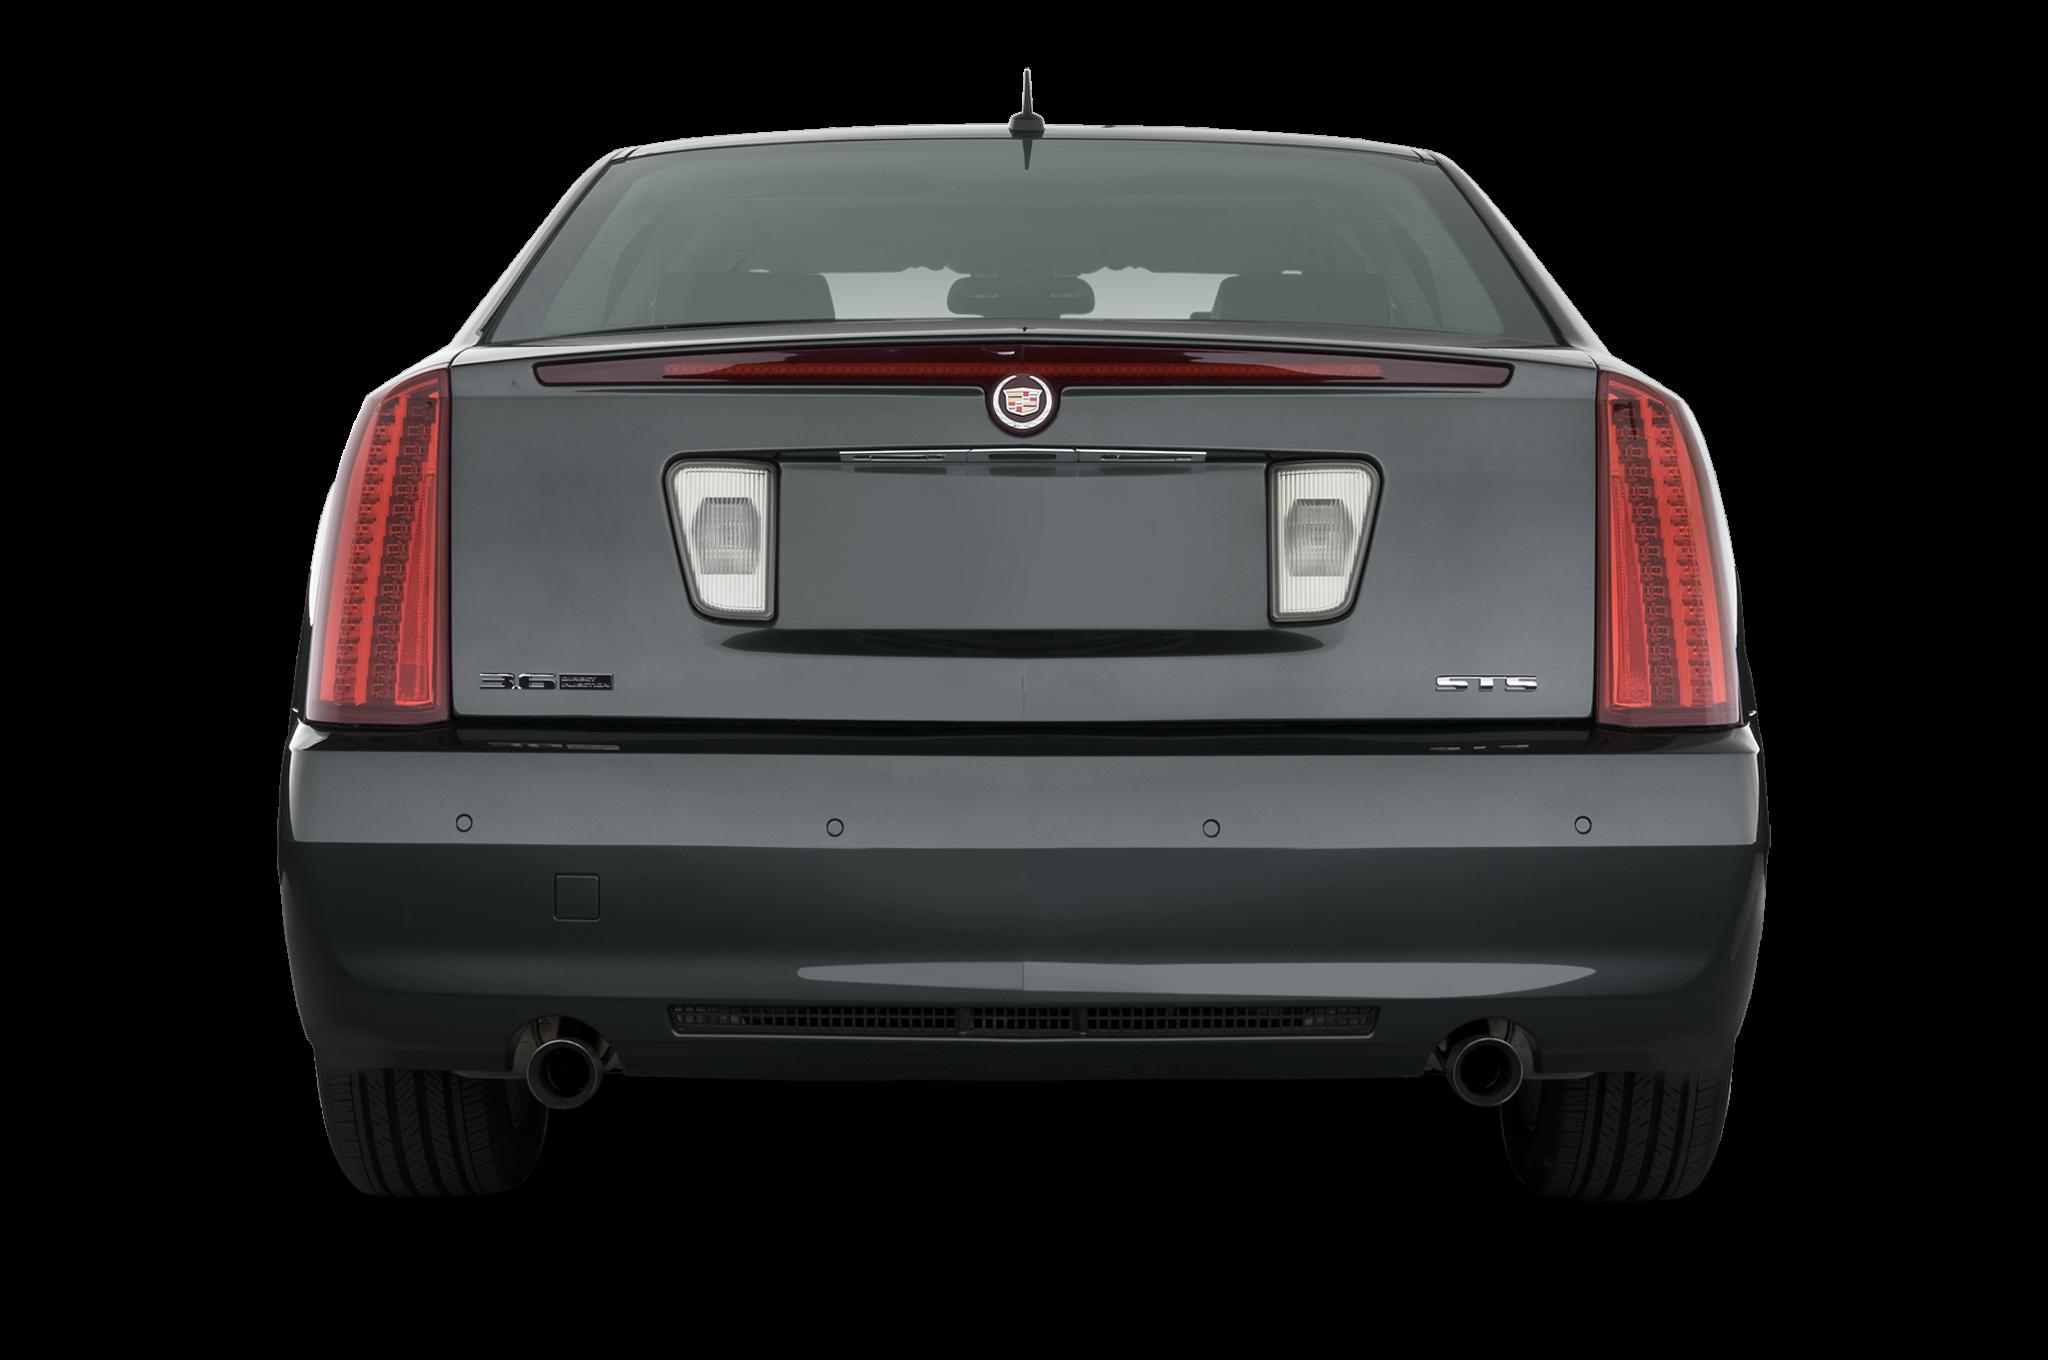 cadillac wagon news rear sport performance cts review luxury sts angular sedan l